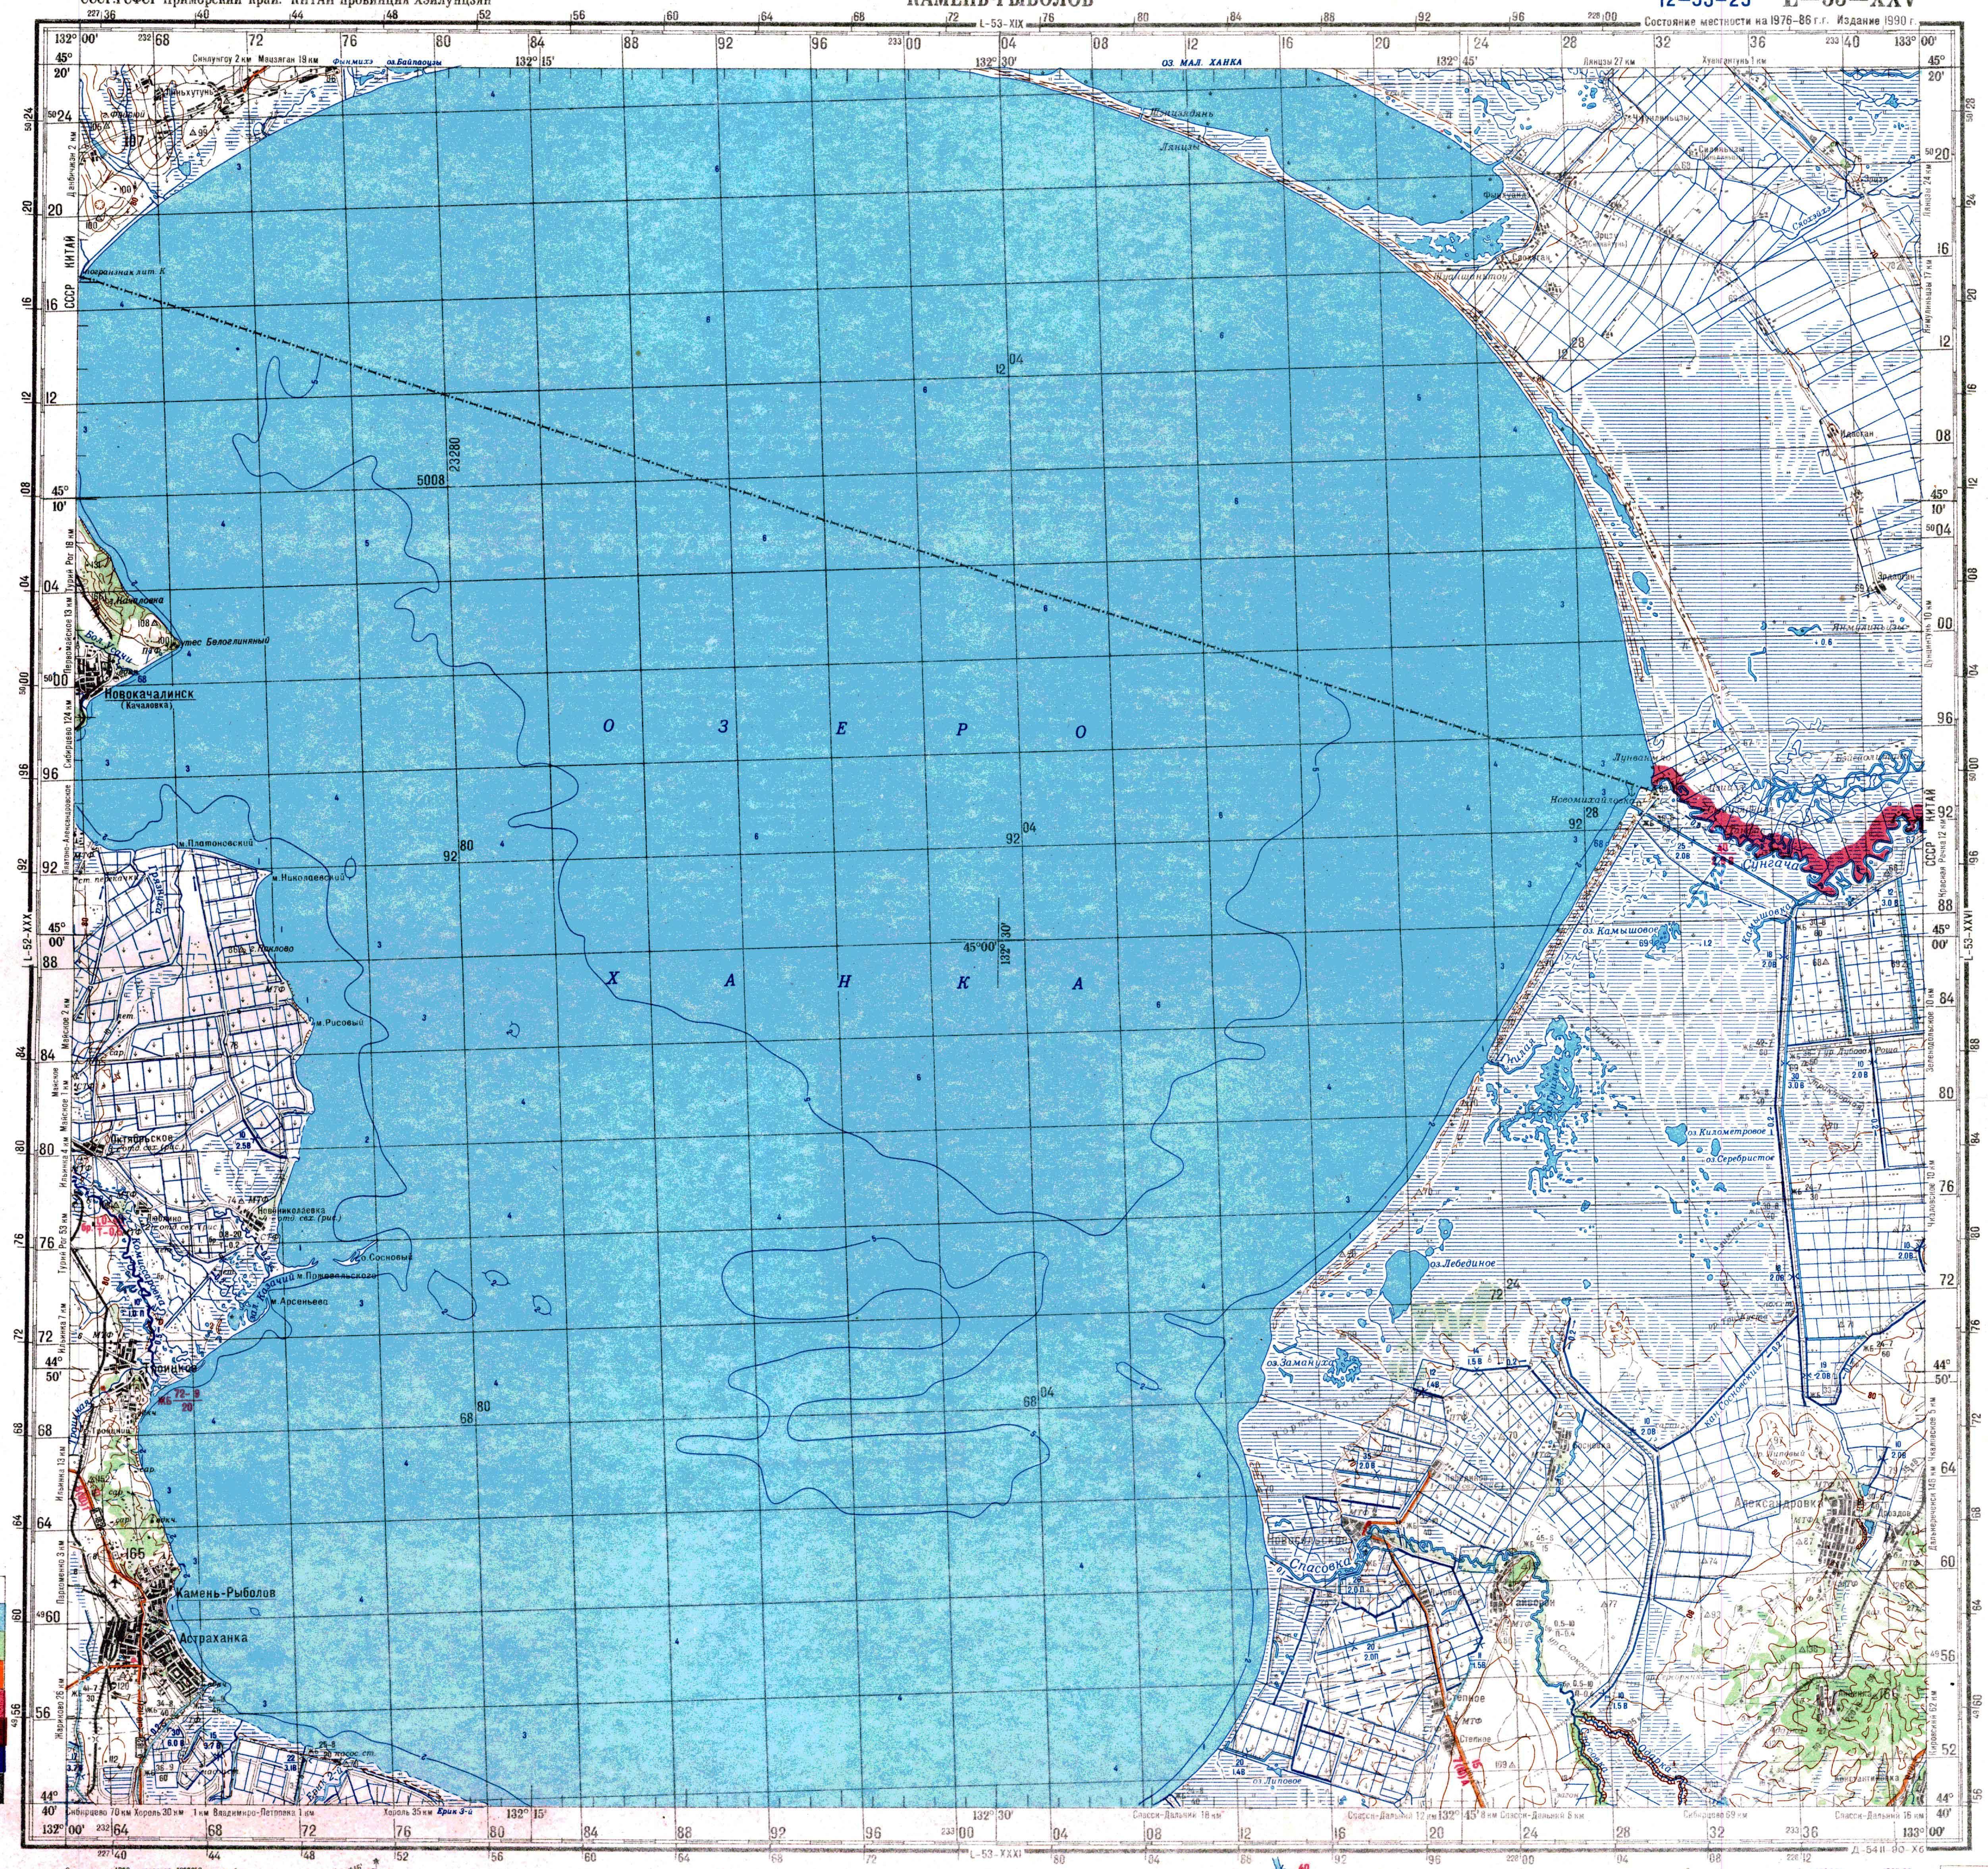 поселок камень рыболов на карте